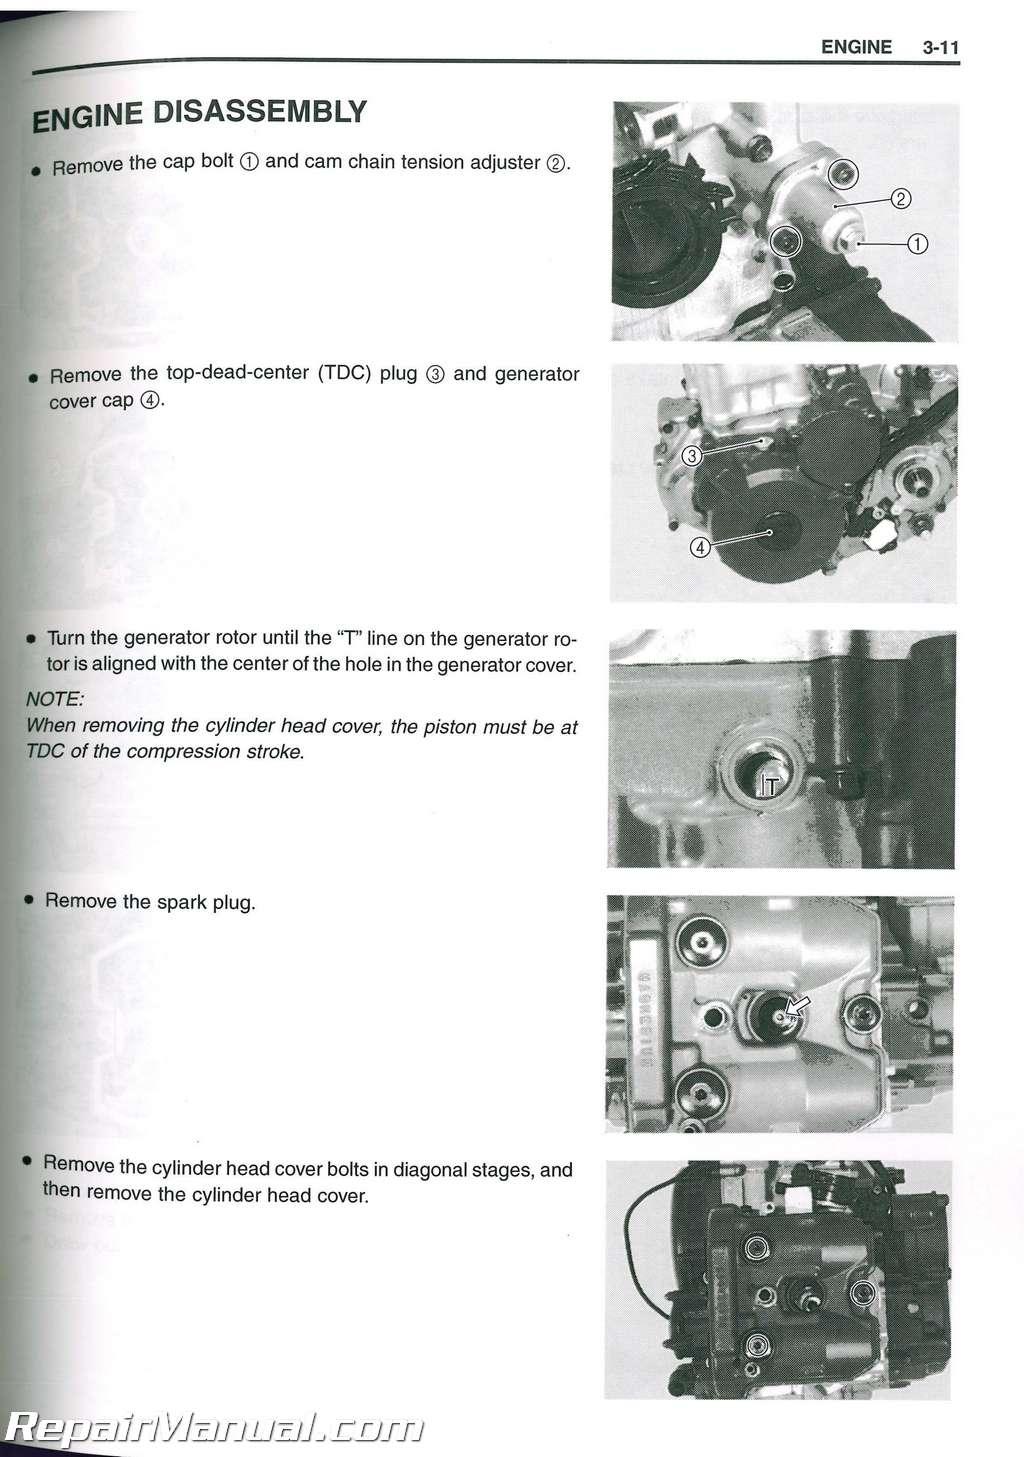 2005 2011 suzuki dr z400sm supermoto 2000 2011 dr z400s paper rh repairmanual com drz400 service manual pdf drz400 service manual pdf download